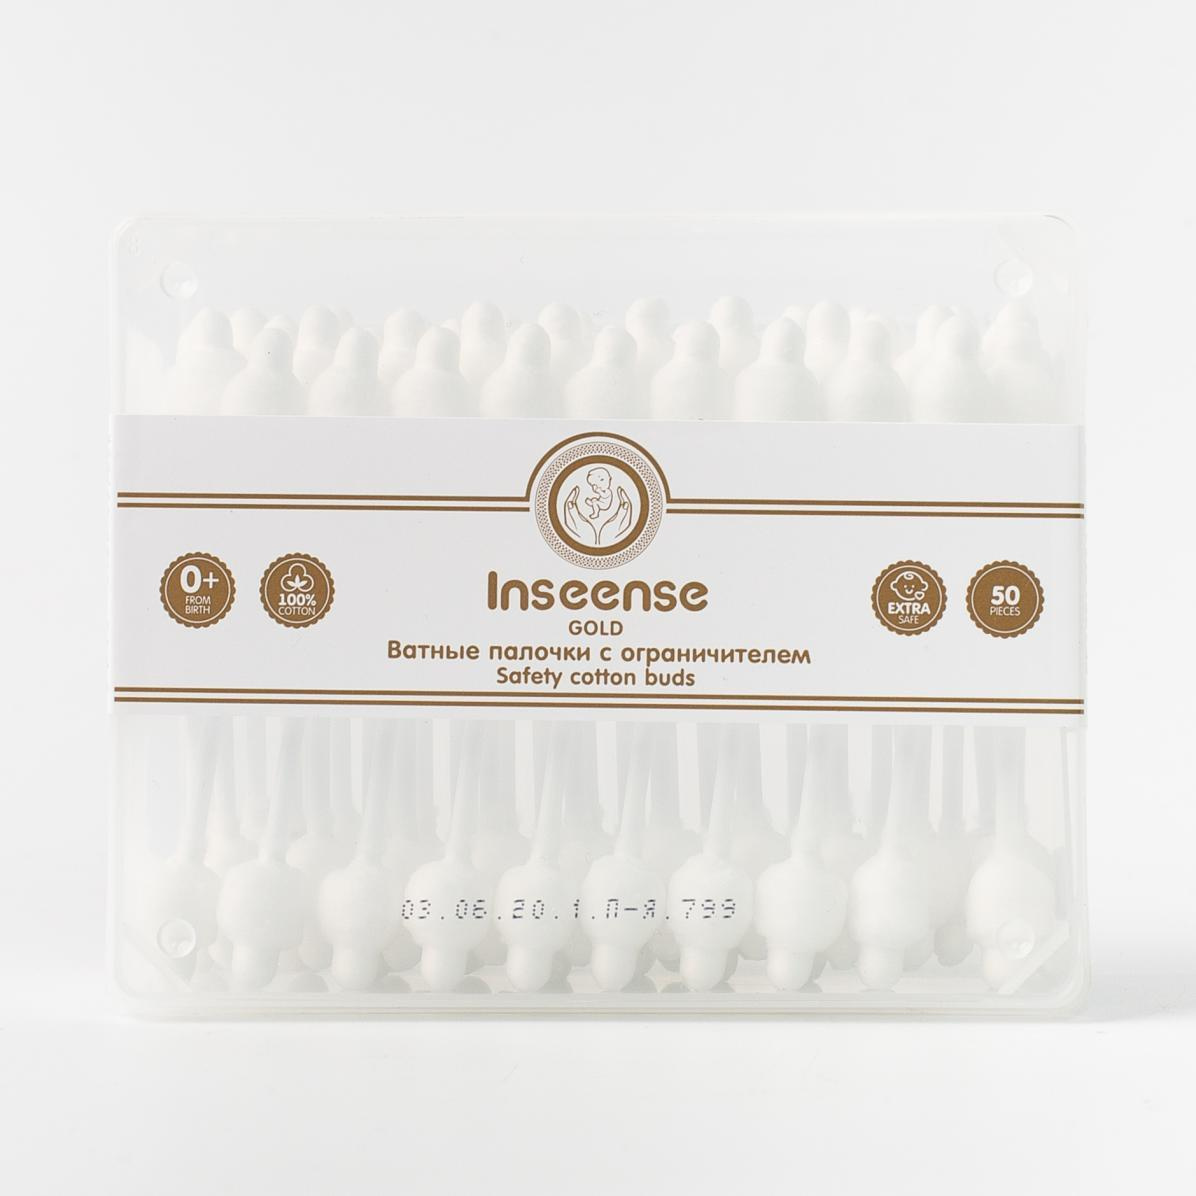 Inseense Gold с ограничителем